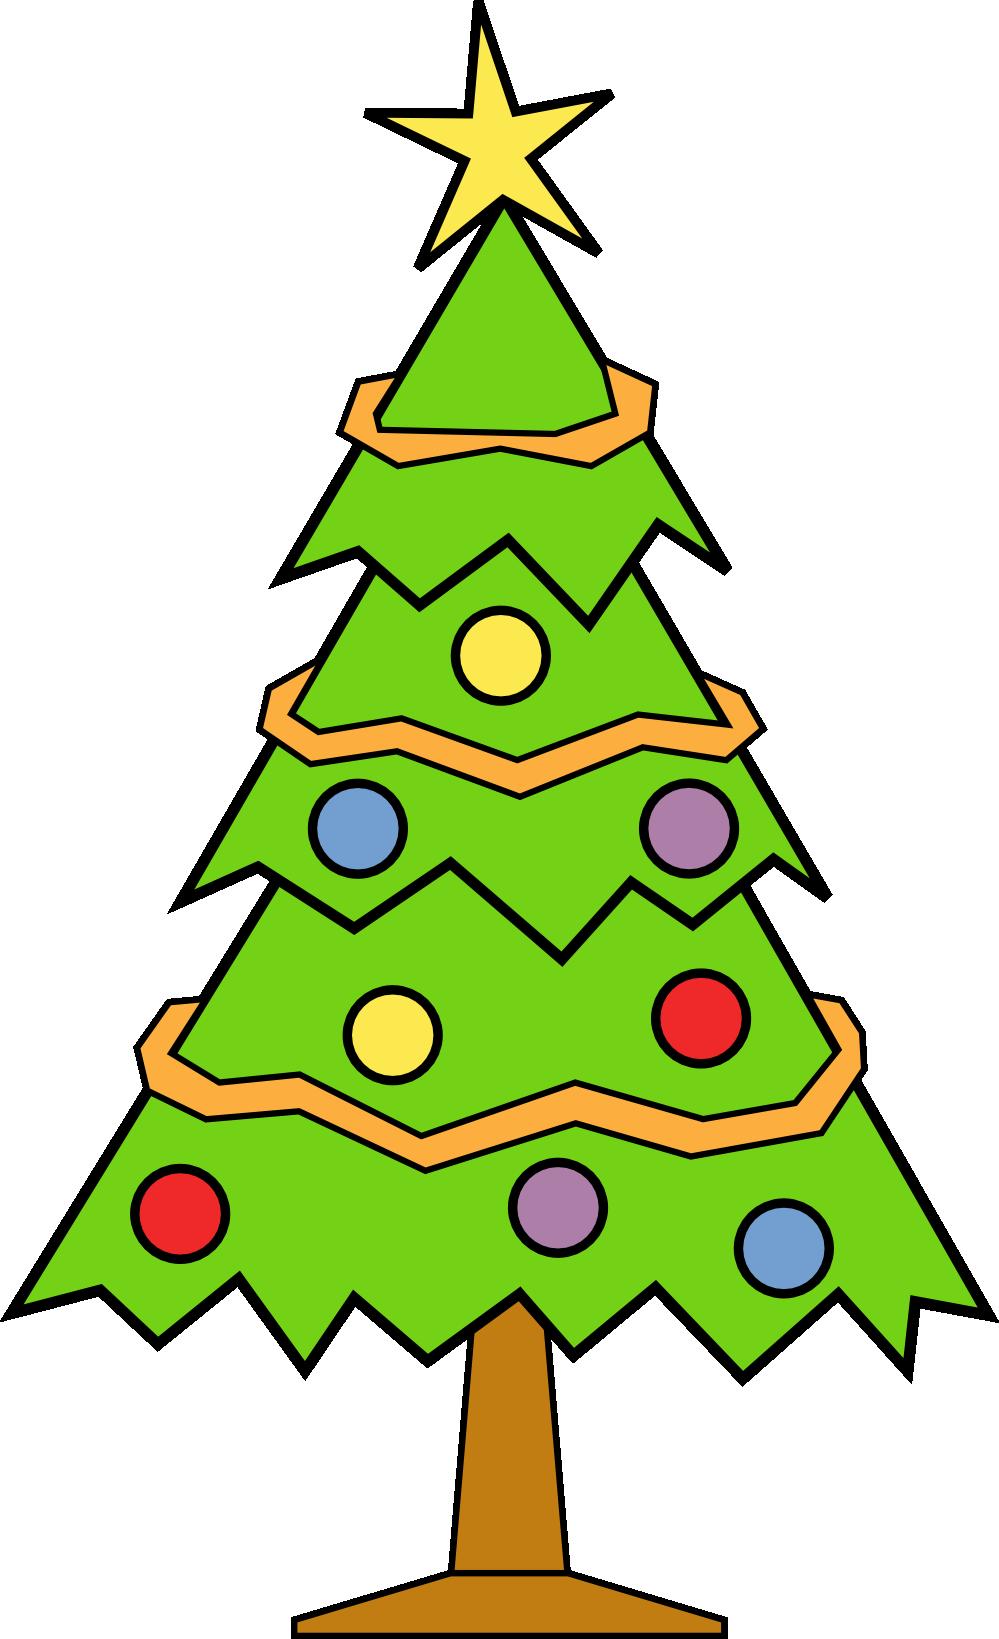 Grinch desktop backgrounds christmas. Nativity clipart december